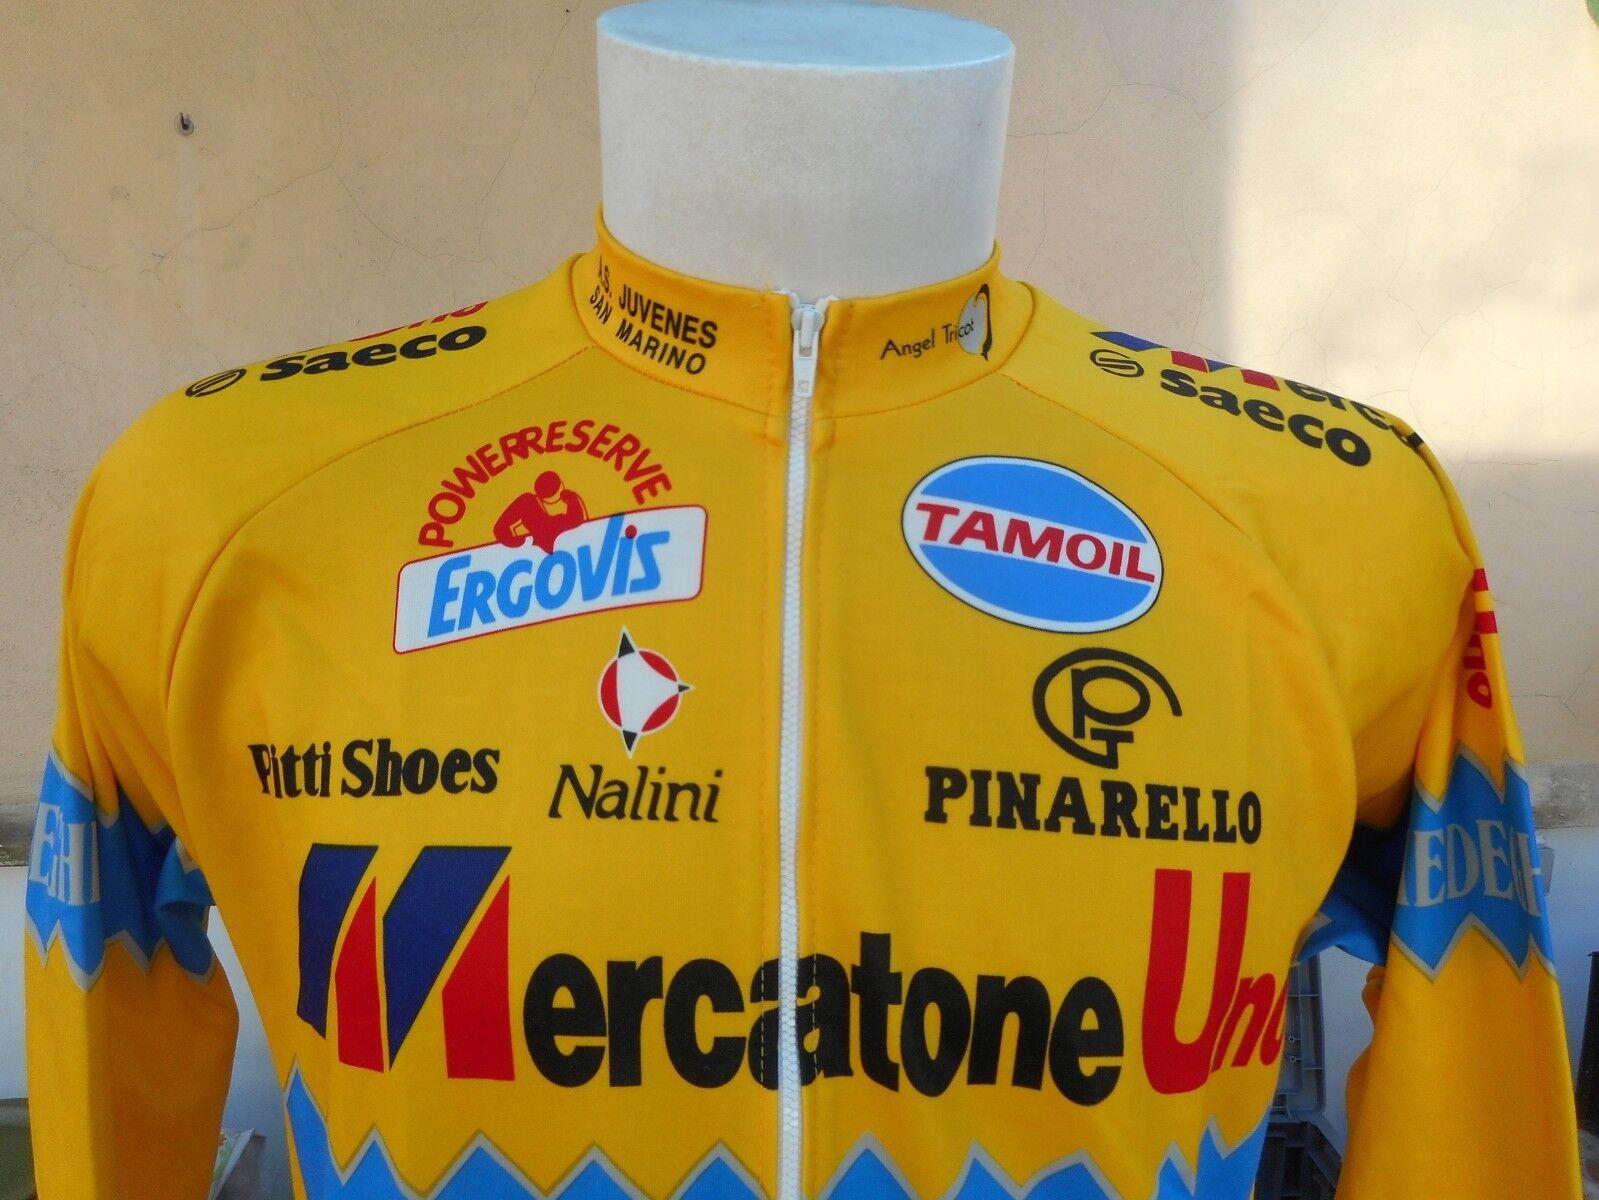 MAGLIA CICLISMO MERCATONE UNO JERSEY NALINI 1990s VINTAGE CYCLING SHIRT JERSEY UNO 0115 52a2c6